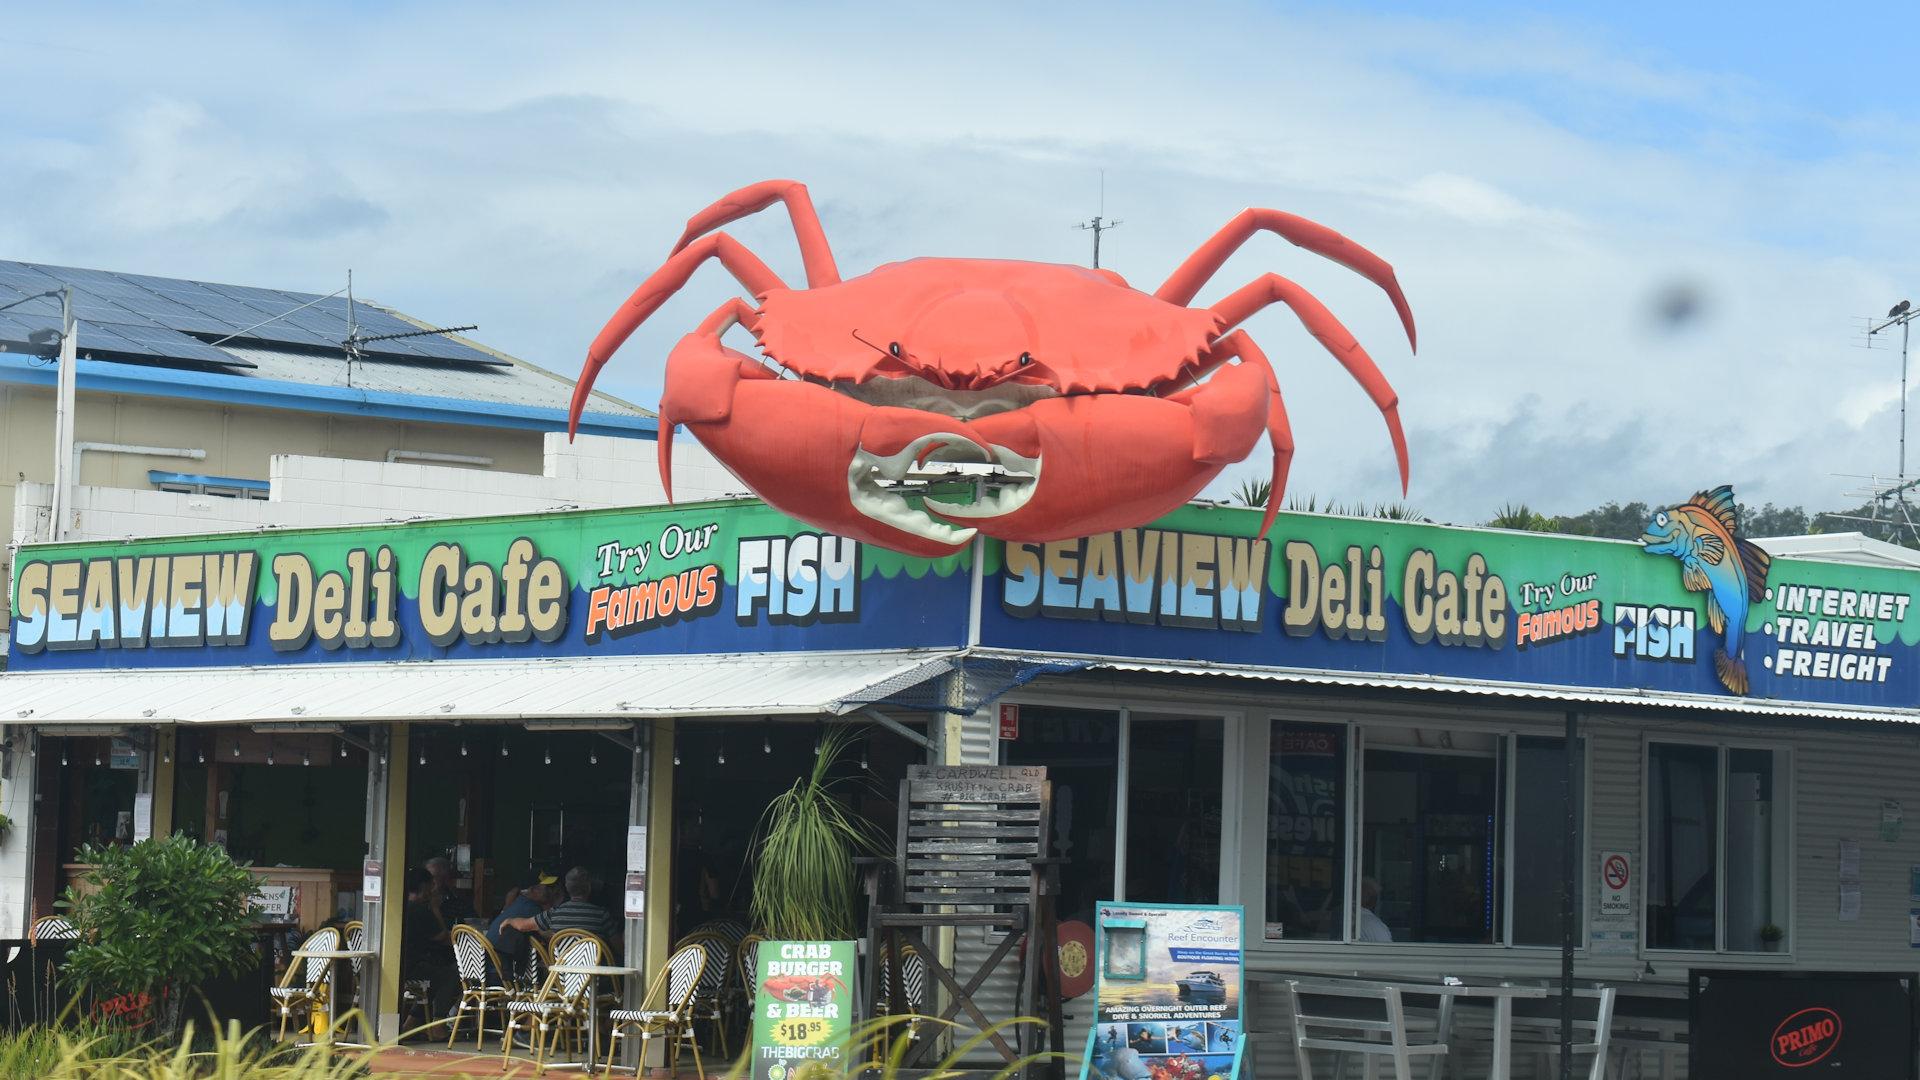 Big Crab above the Cardwell Seaview Deli